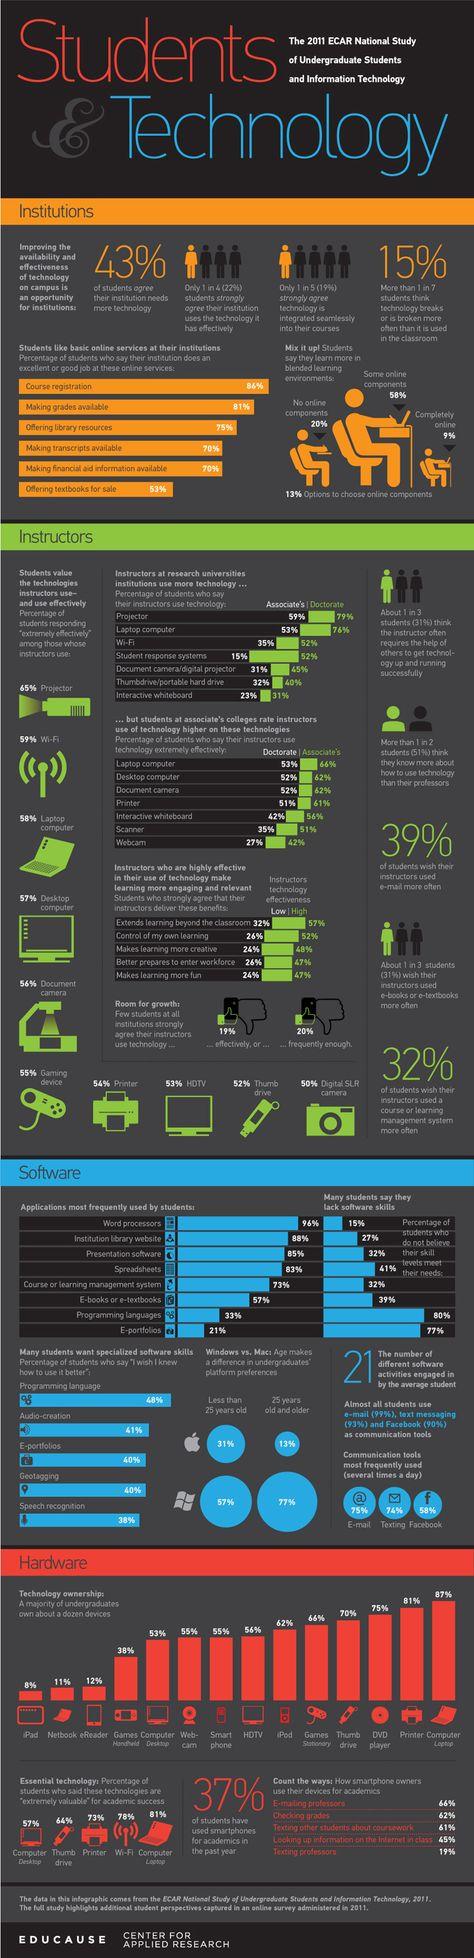 Pin By Rodrigo Sandivar On Education Student Technology Educational Infographic Learning Technology